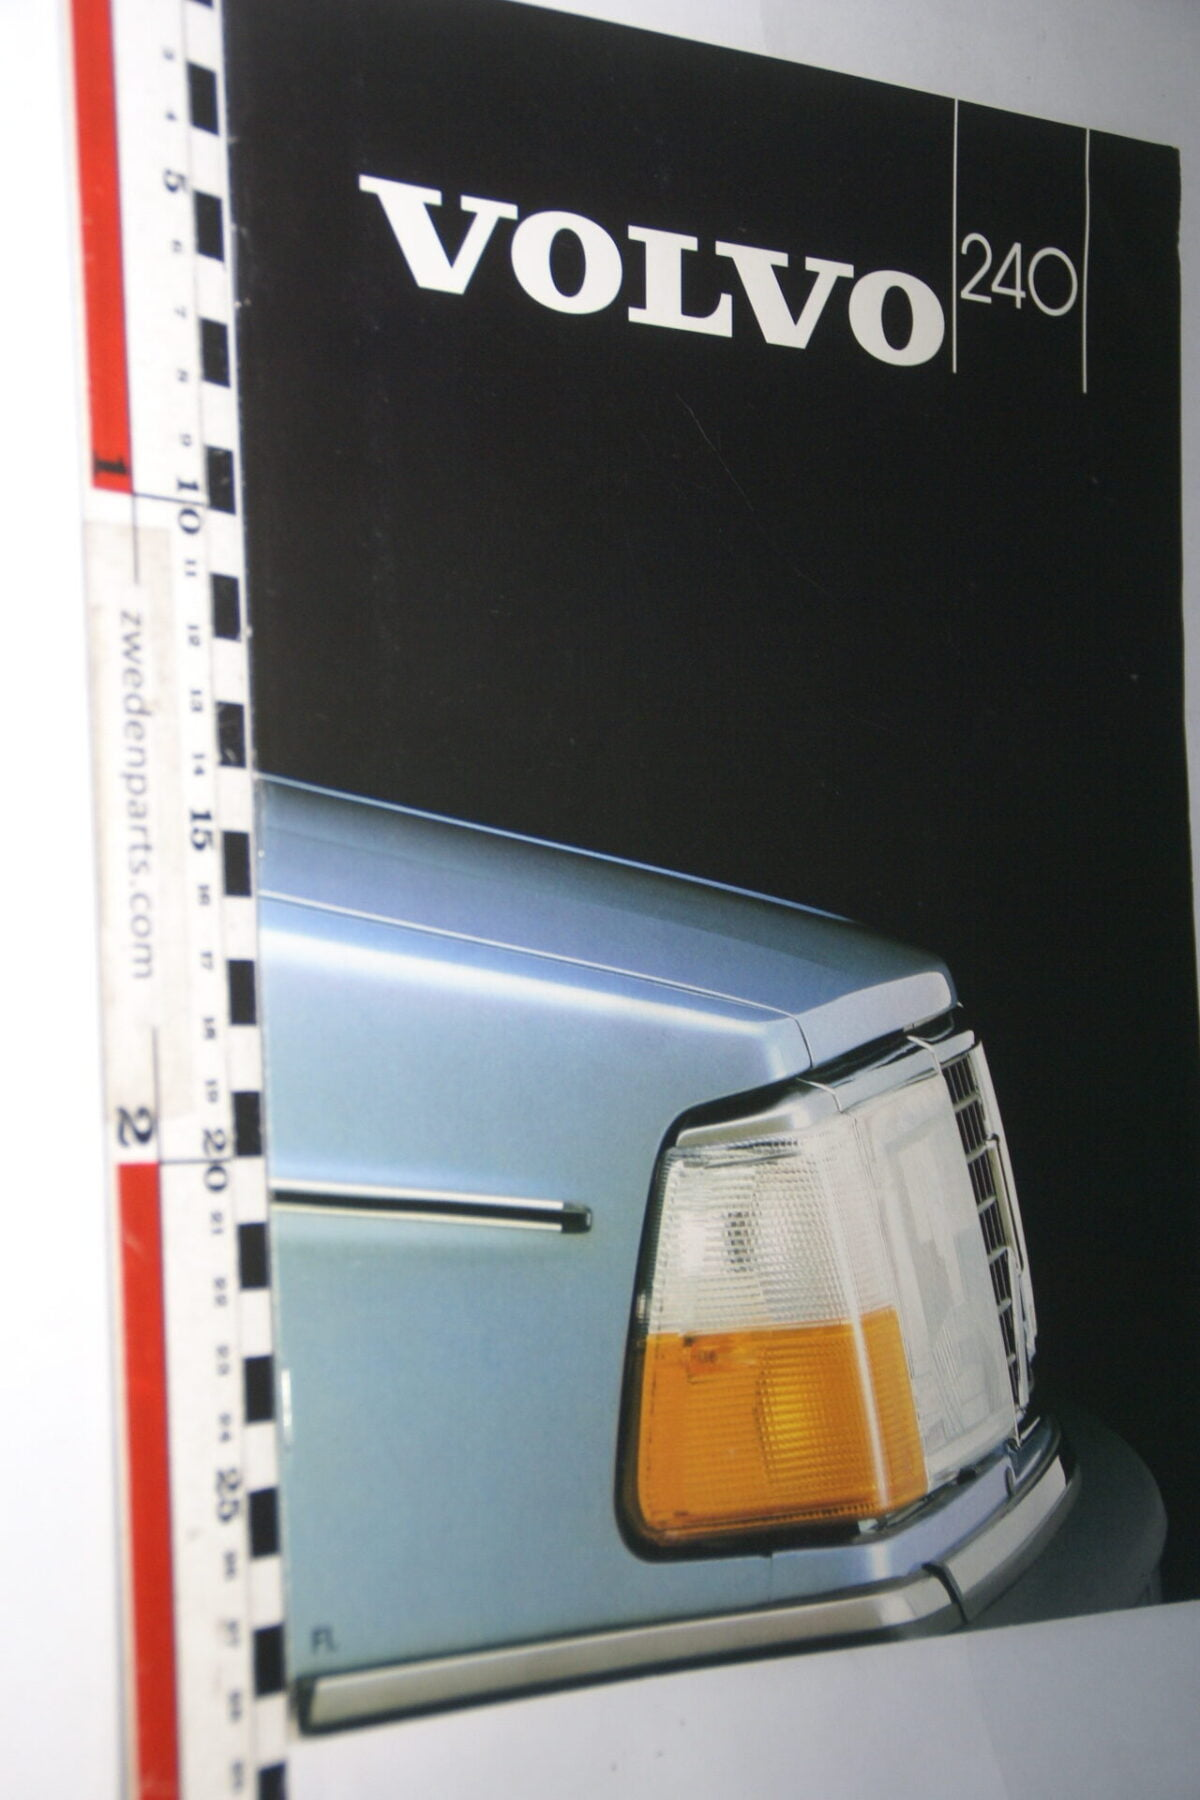 DSC07706 1982 originele brochure Volvo 244 245 nr ASPPV 9584, Vlaams-4e907c6f